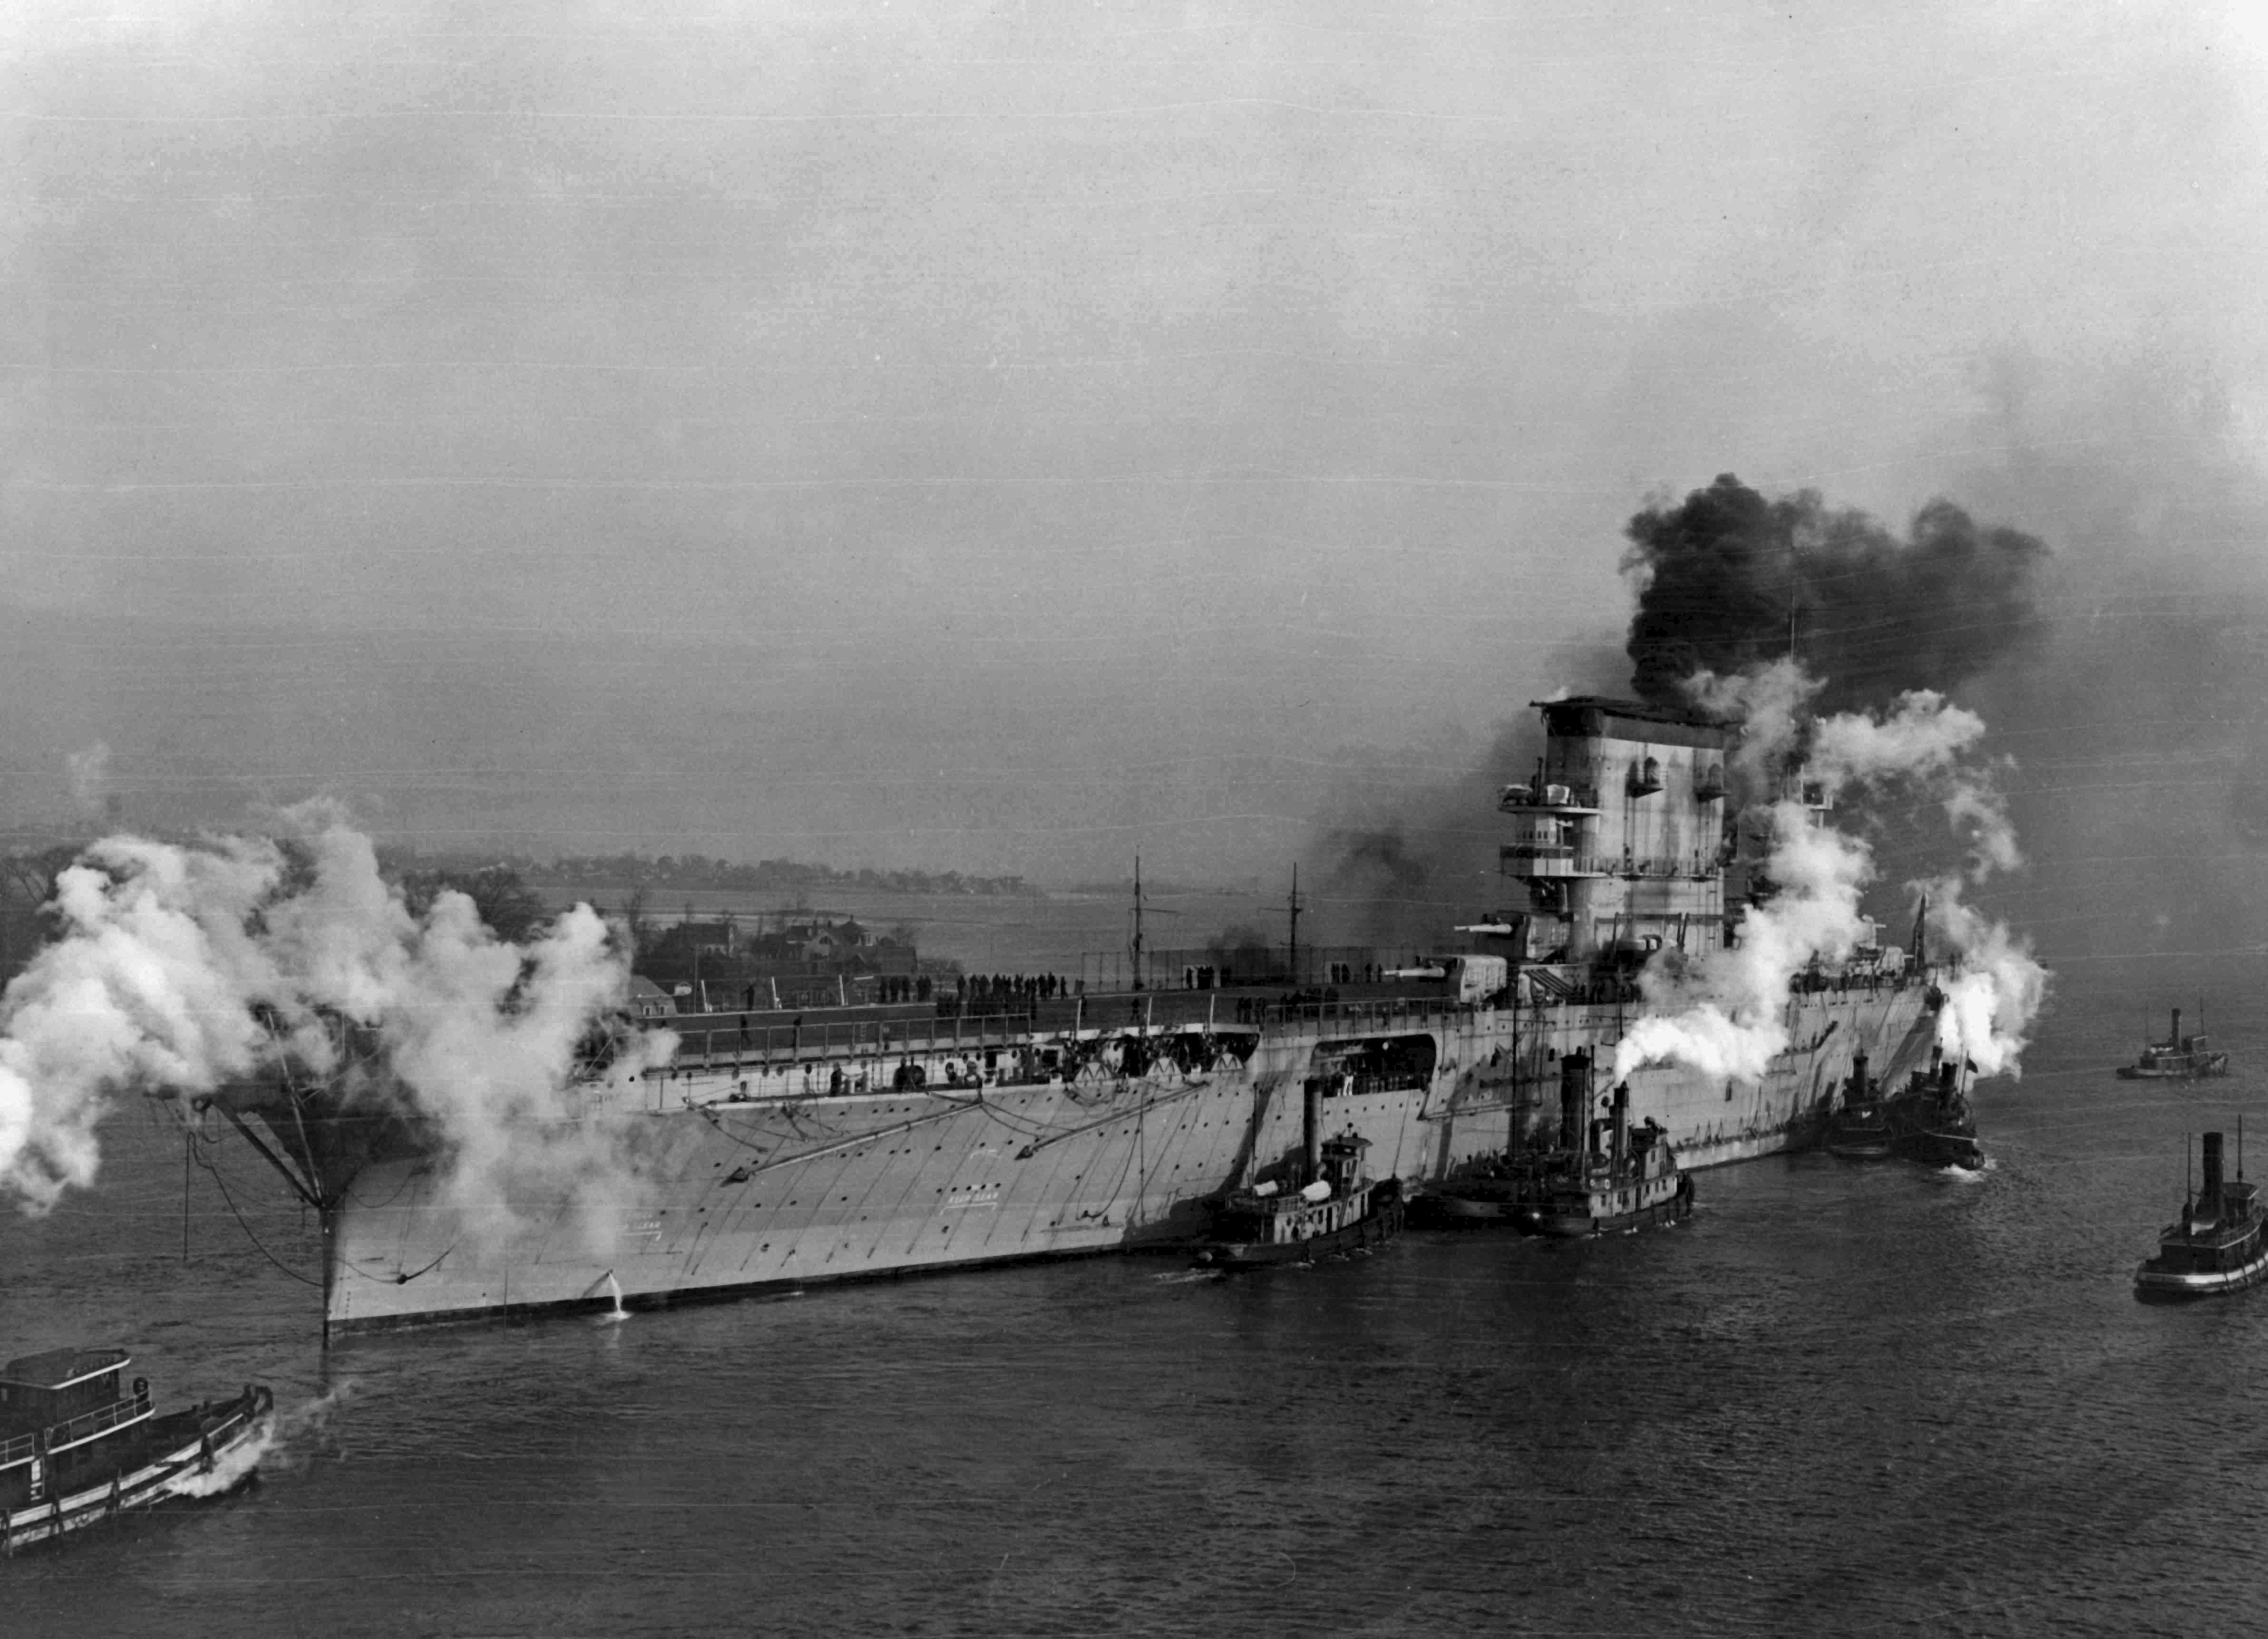 önéletrajz wiki File:USS Lexington (CV 2) with tugs in January 1928.   Wikipedia önéletrajz wiki